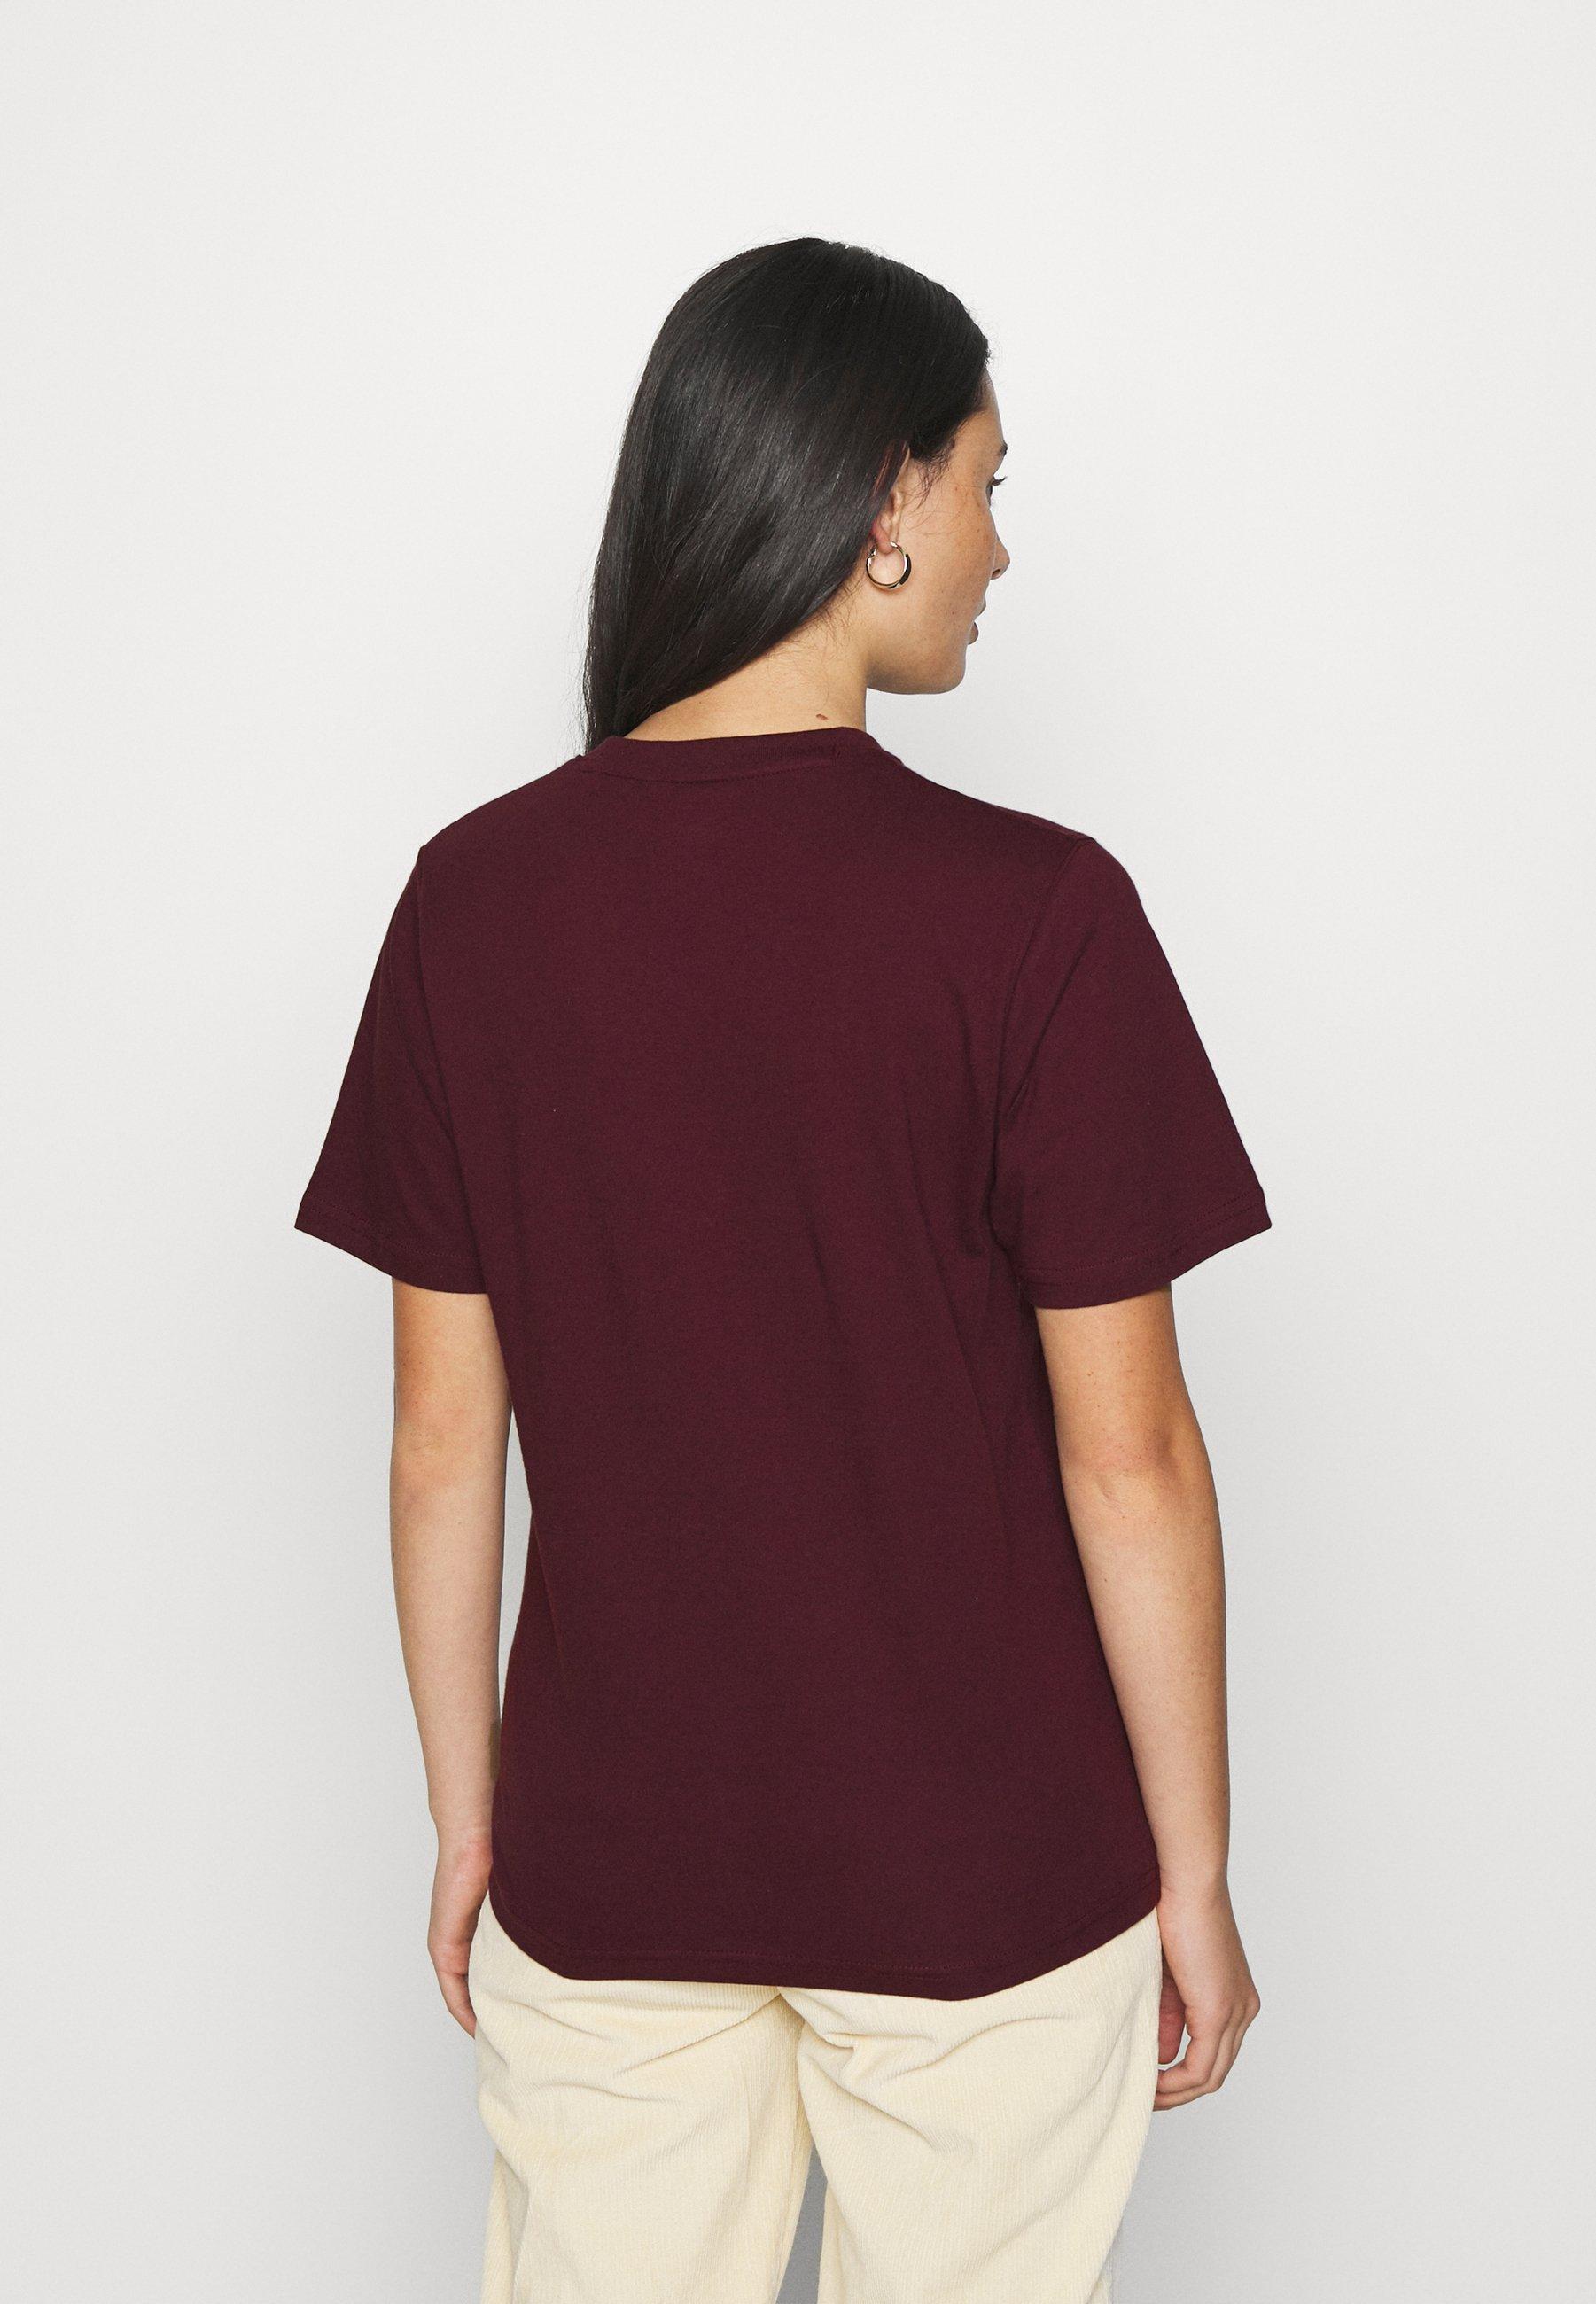 Dickies Horseshoe Tee - T-shirts Med Print Maroon/vinrød